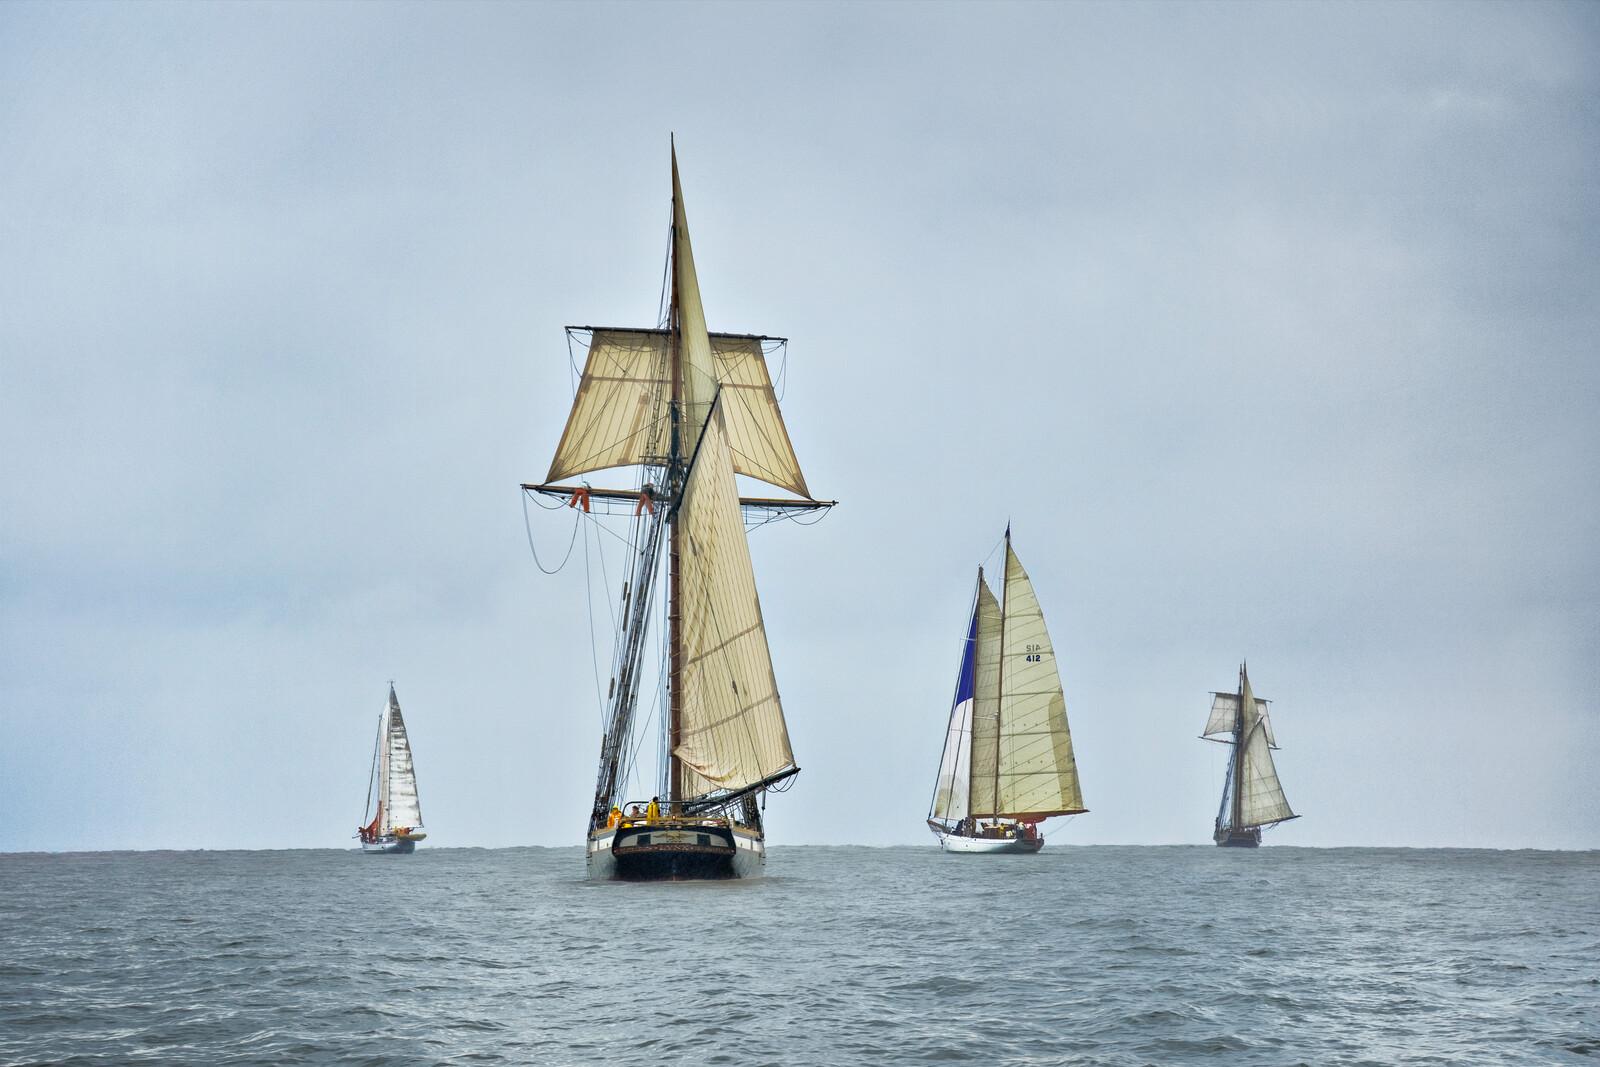 Schooners Racing on the Chesapeake Bay - Greg Pease